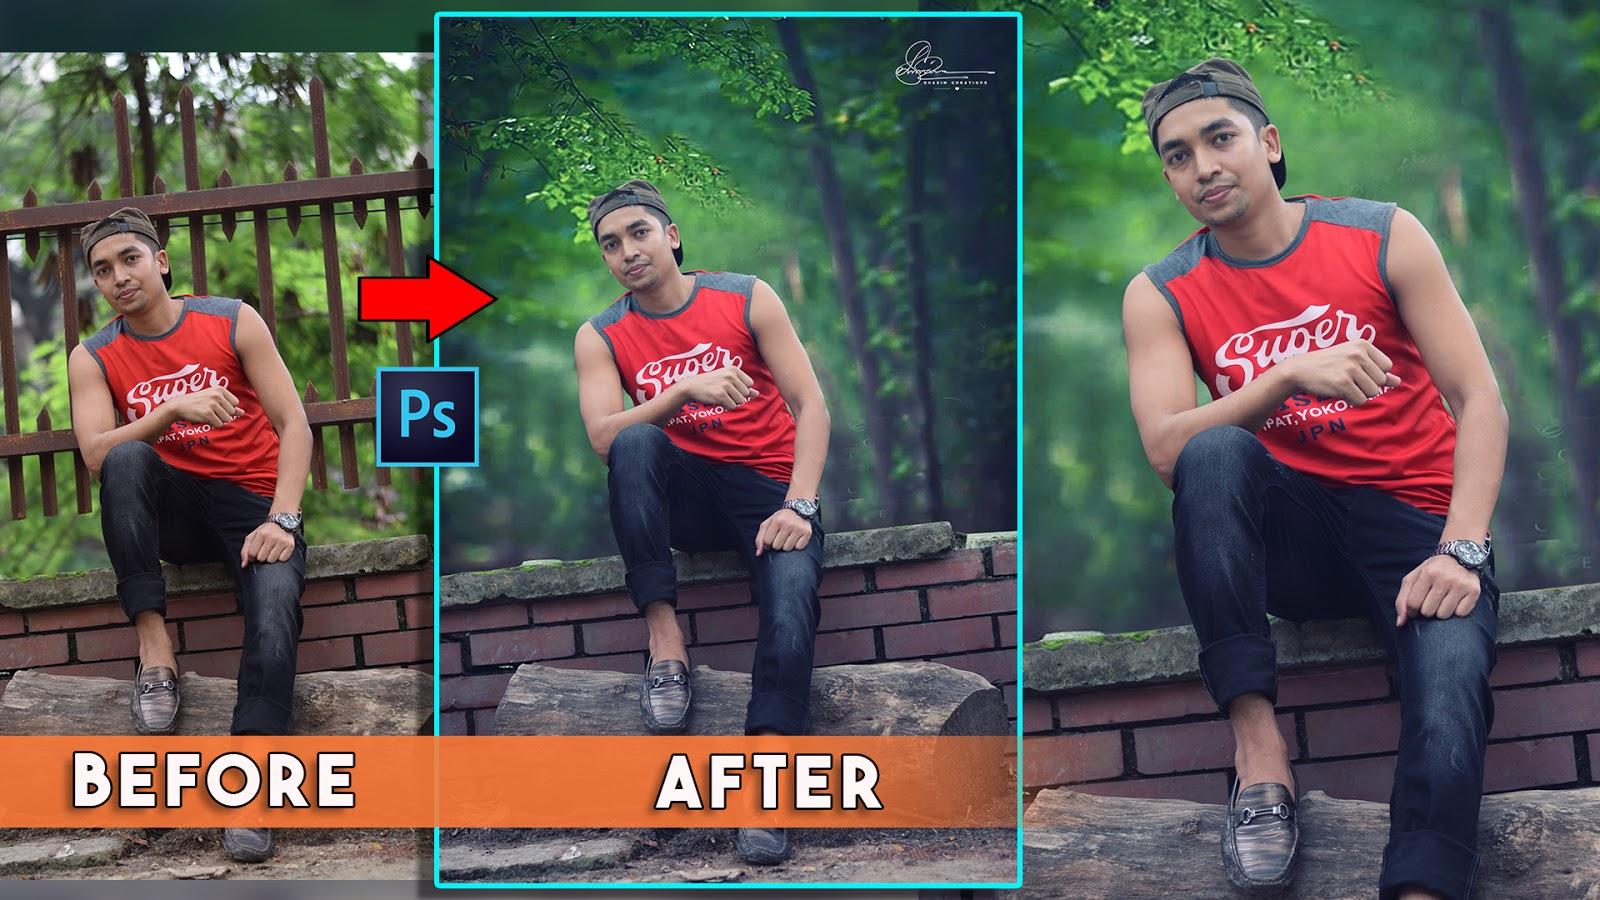 outdoor portrait photo manipulations